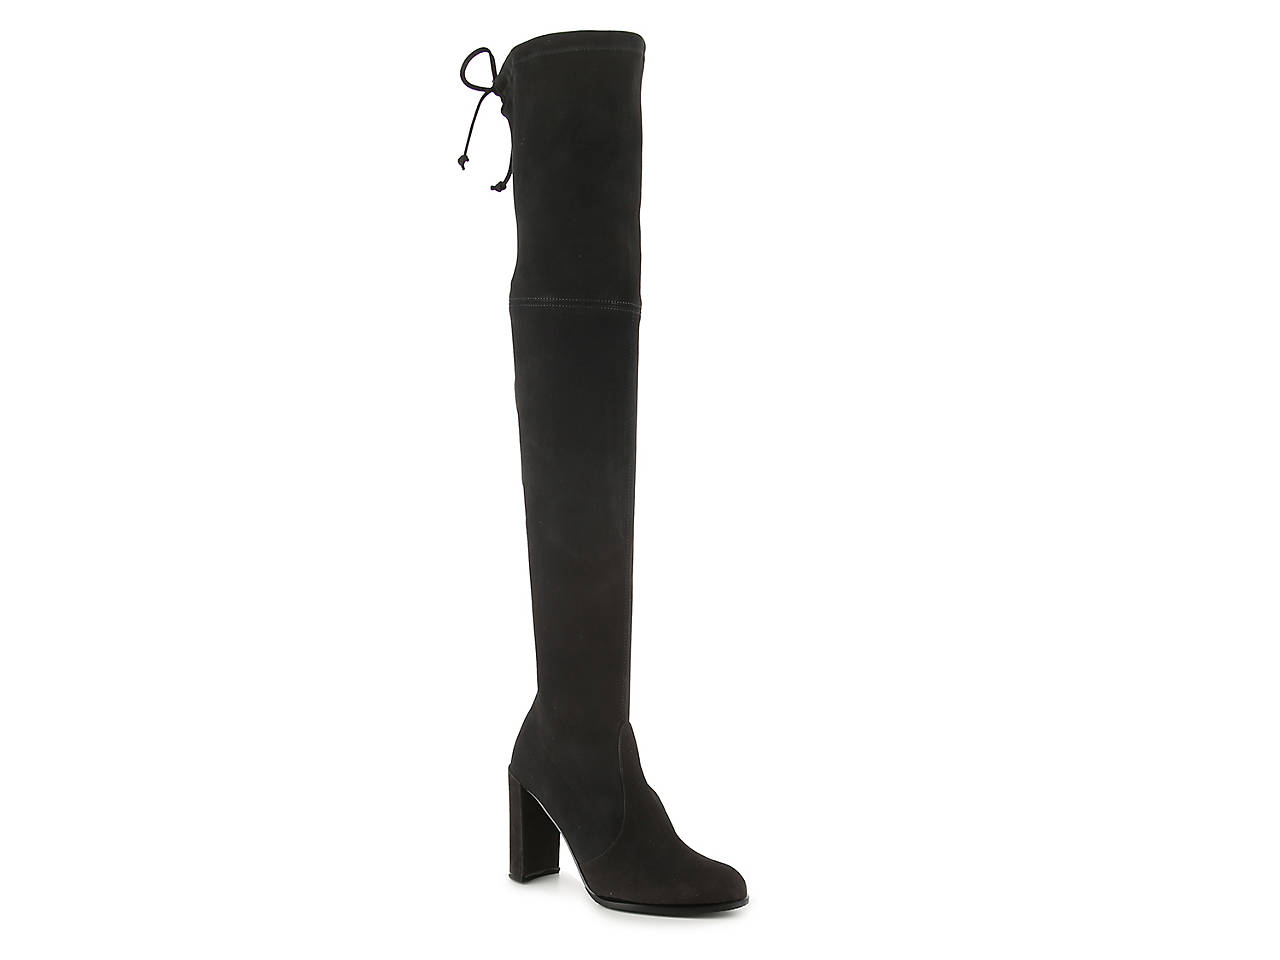 f27480f6cc3 Stuart Weitzman Hiline Thigh High Boot Women s Shoes